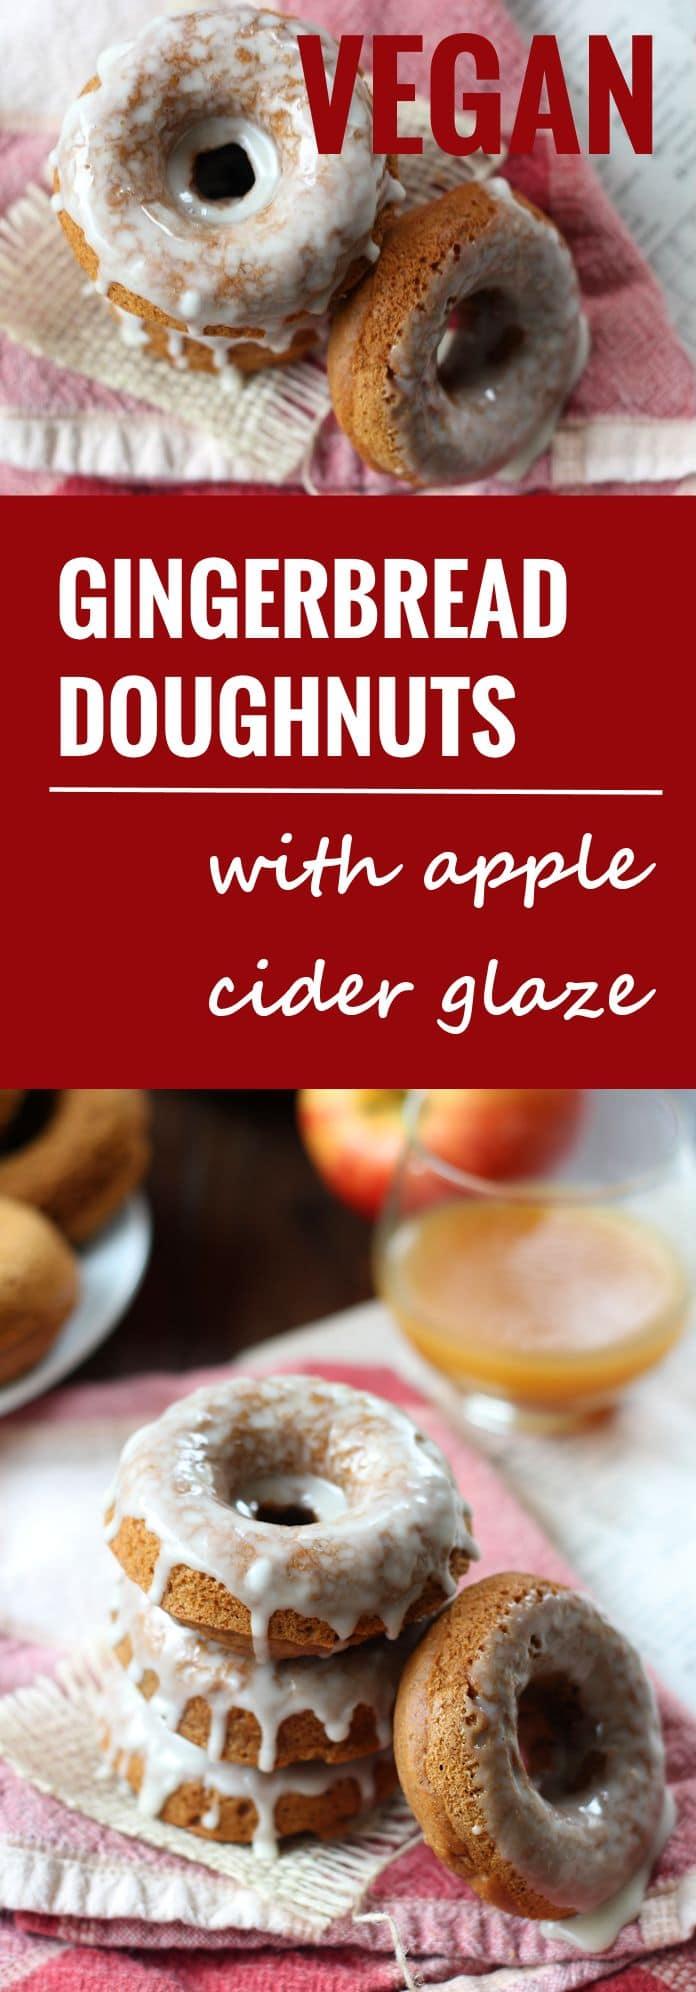 Vegan Gingerbread Doughnuts with Apple Cider Glaze